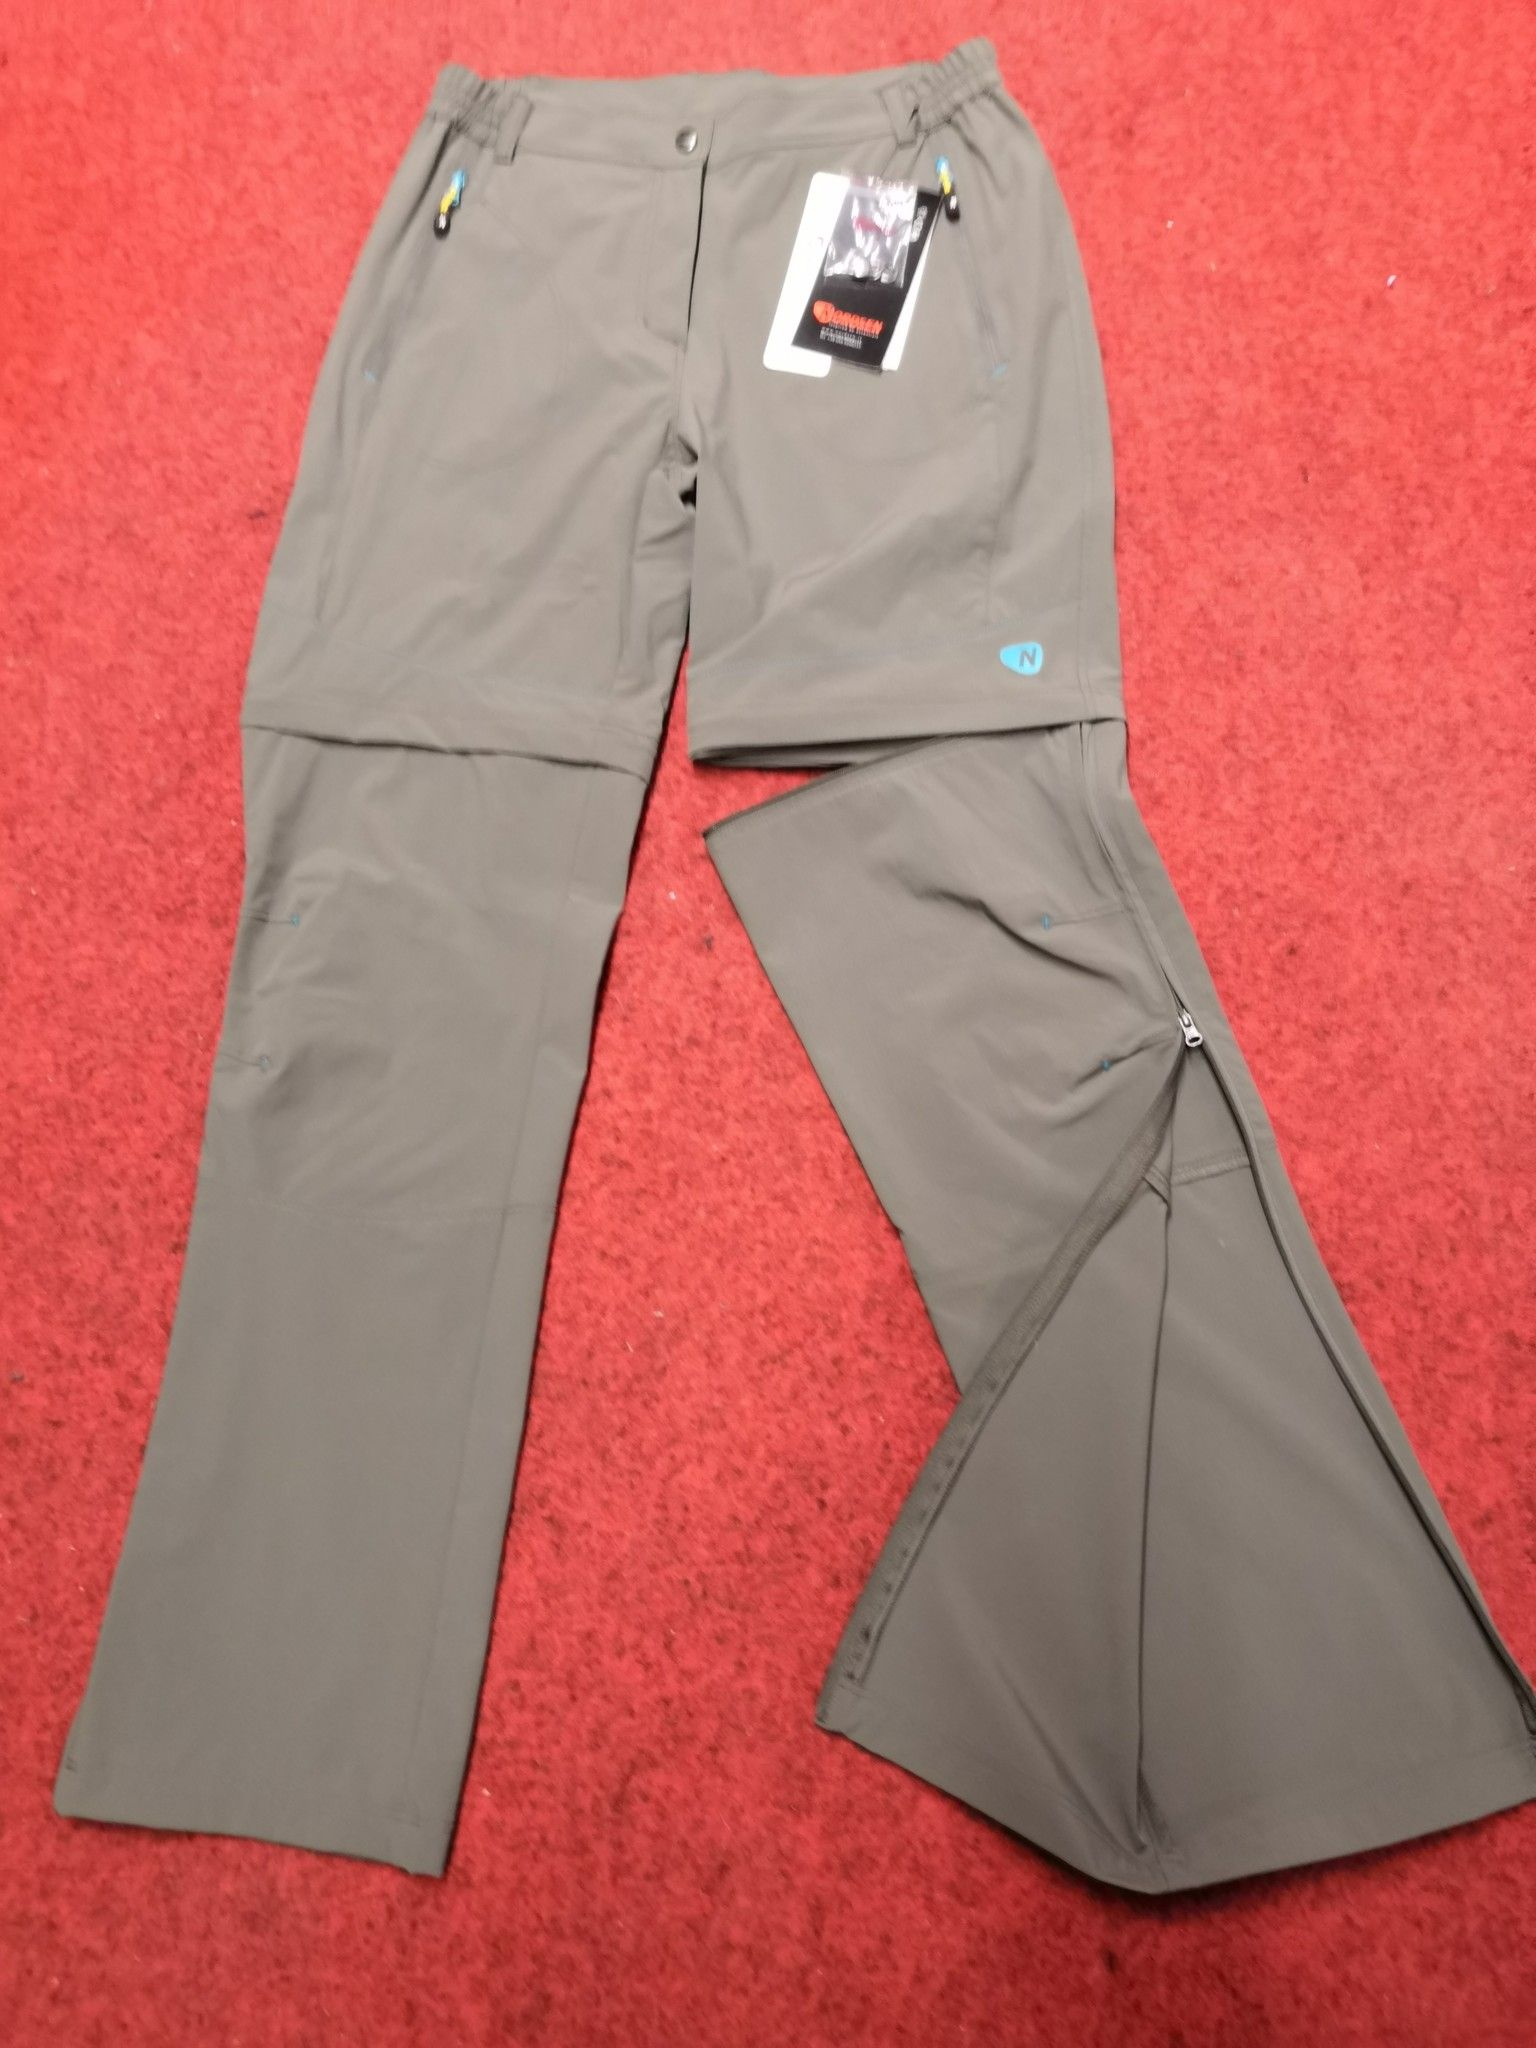 07a42c859d PANTALONI OUTDOOR DONNA NORDSEN | Abbigliamento Donna Pantaloni ...